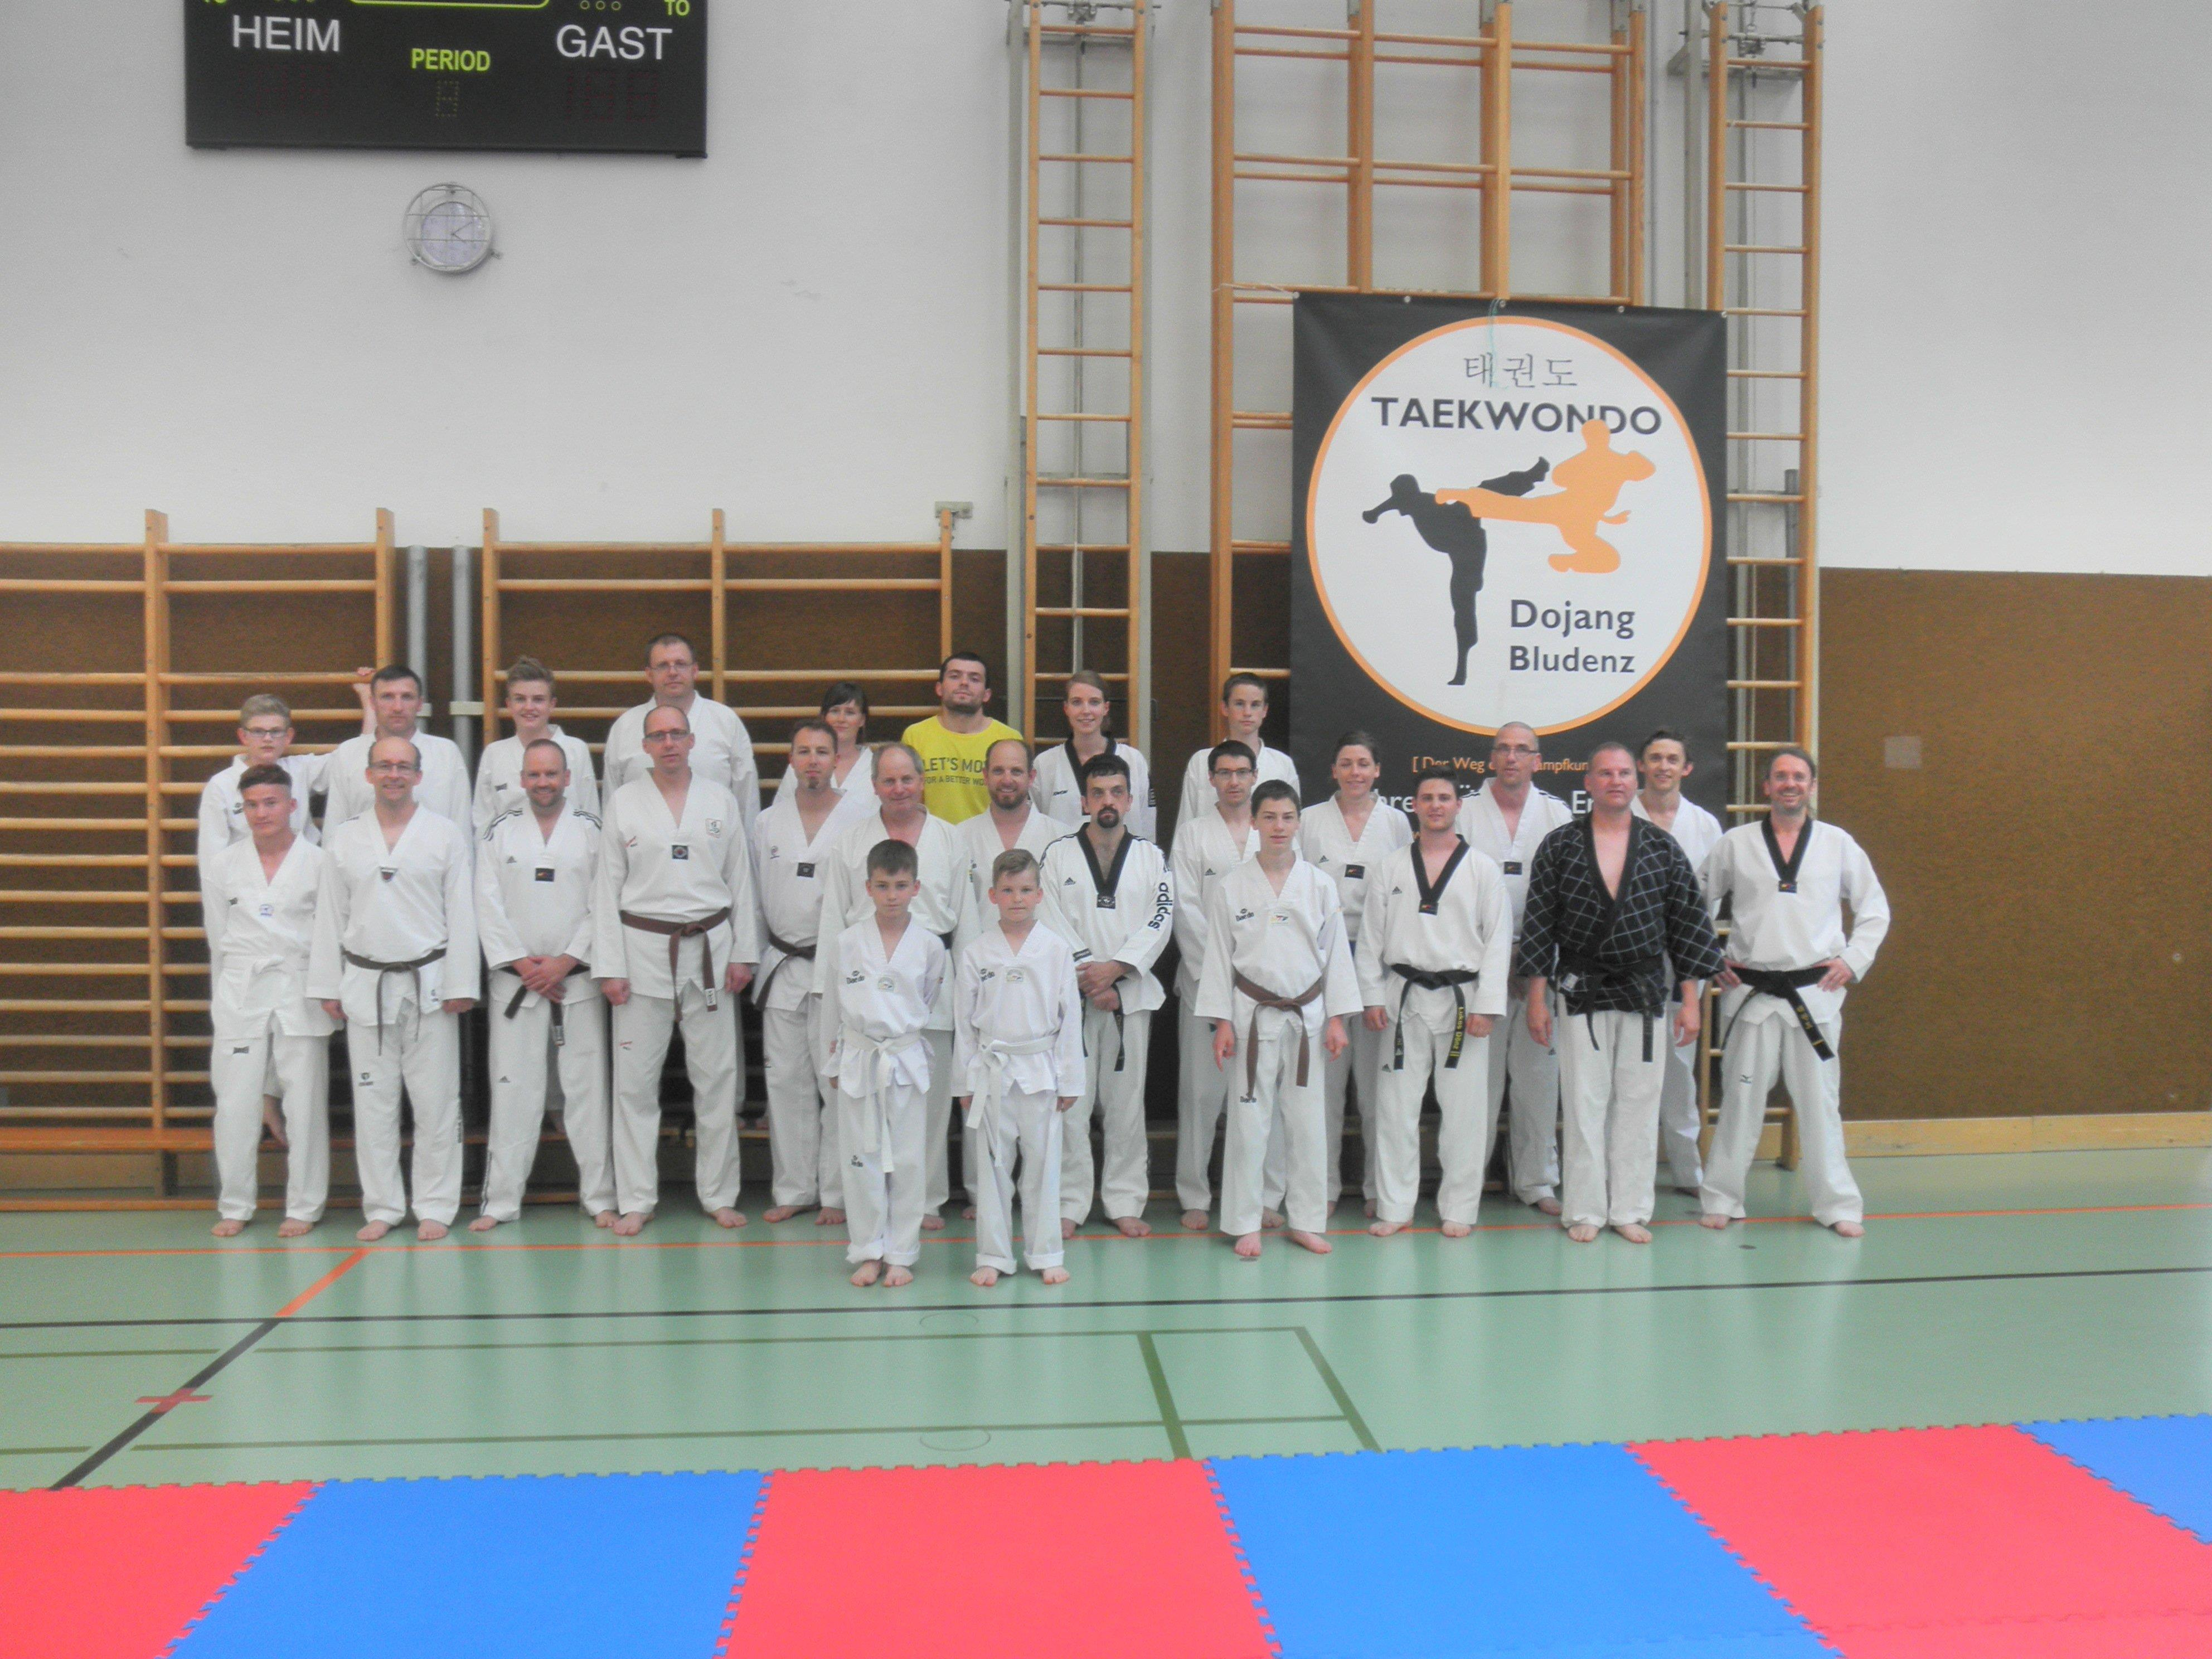 Taekwondo Verein Dojang Bludenz